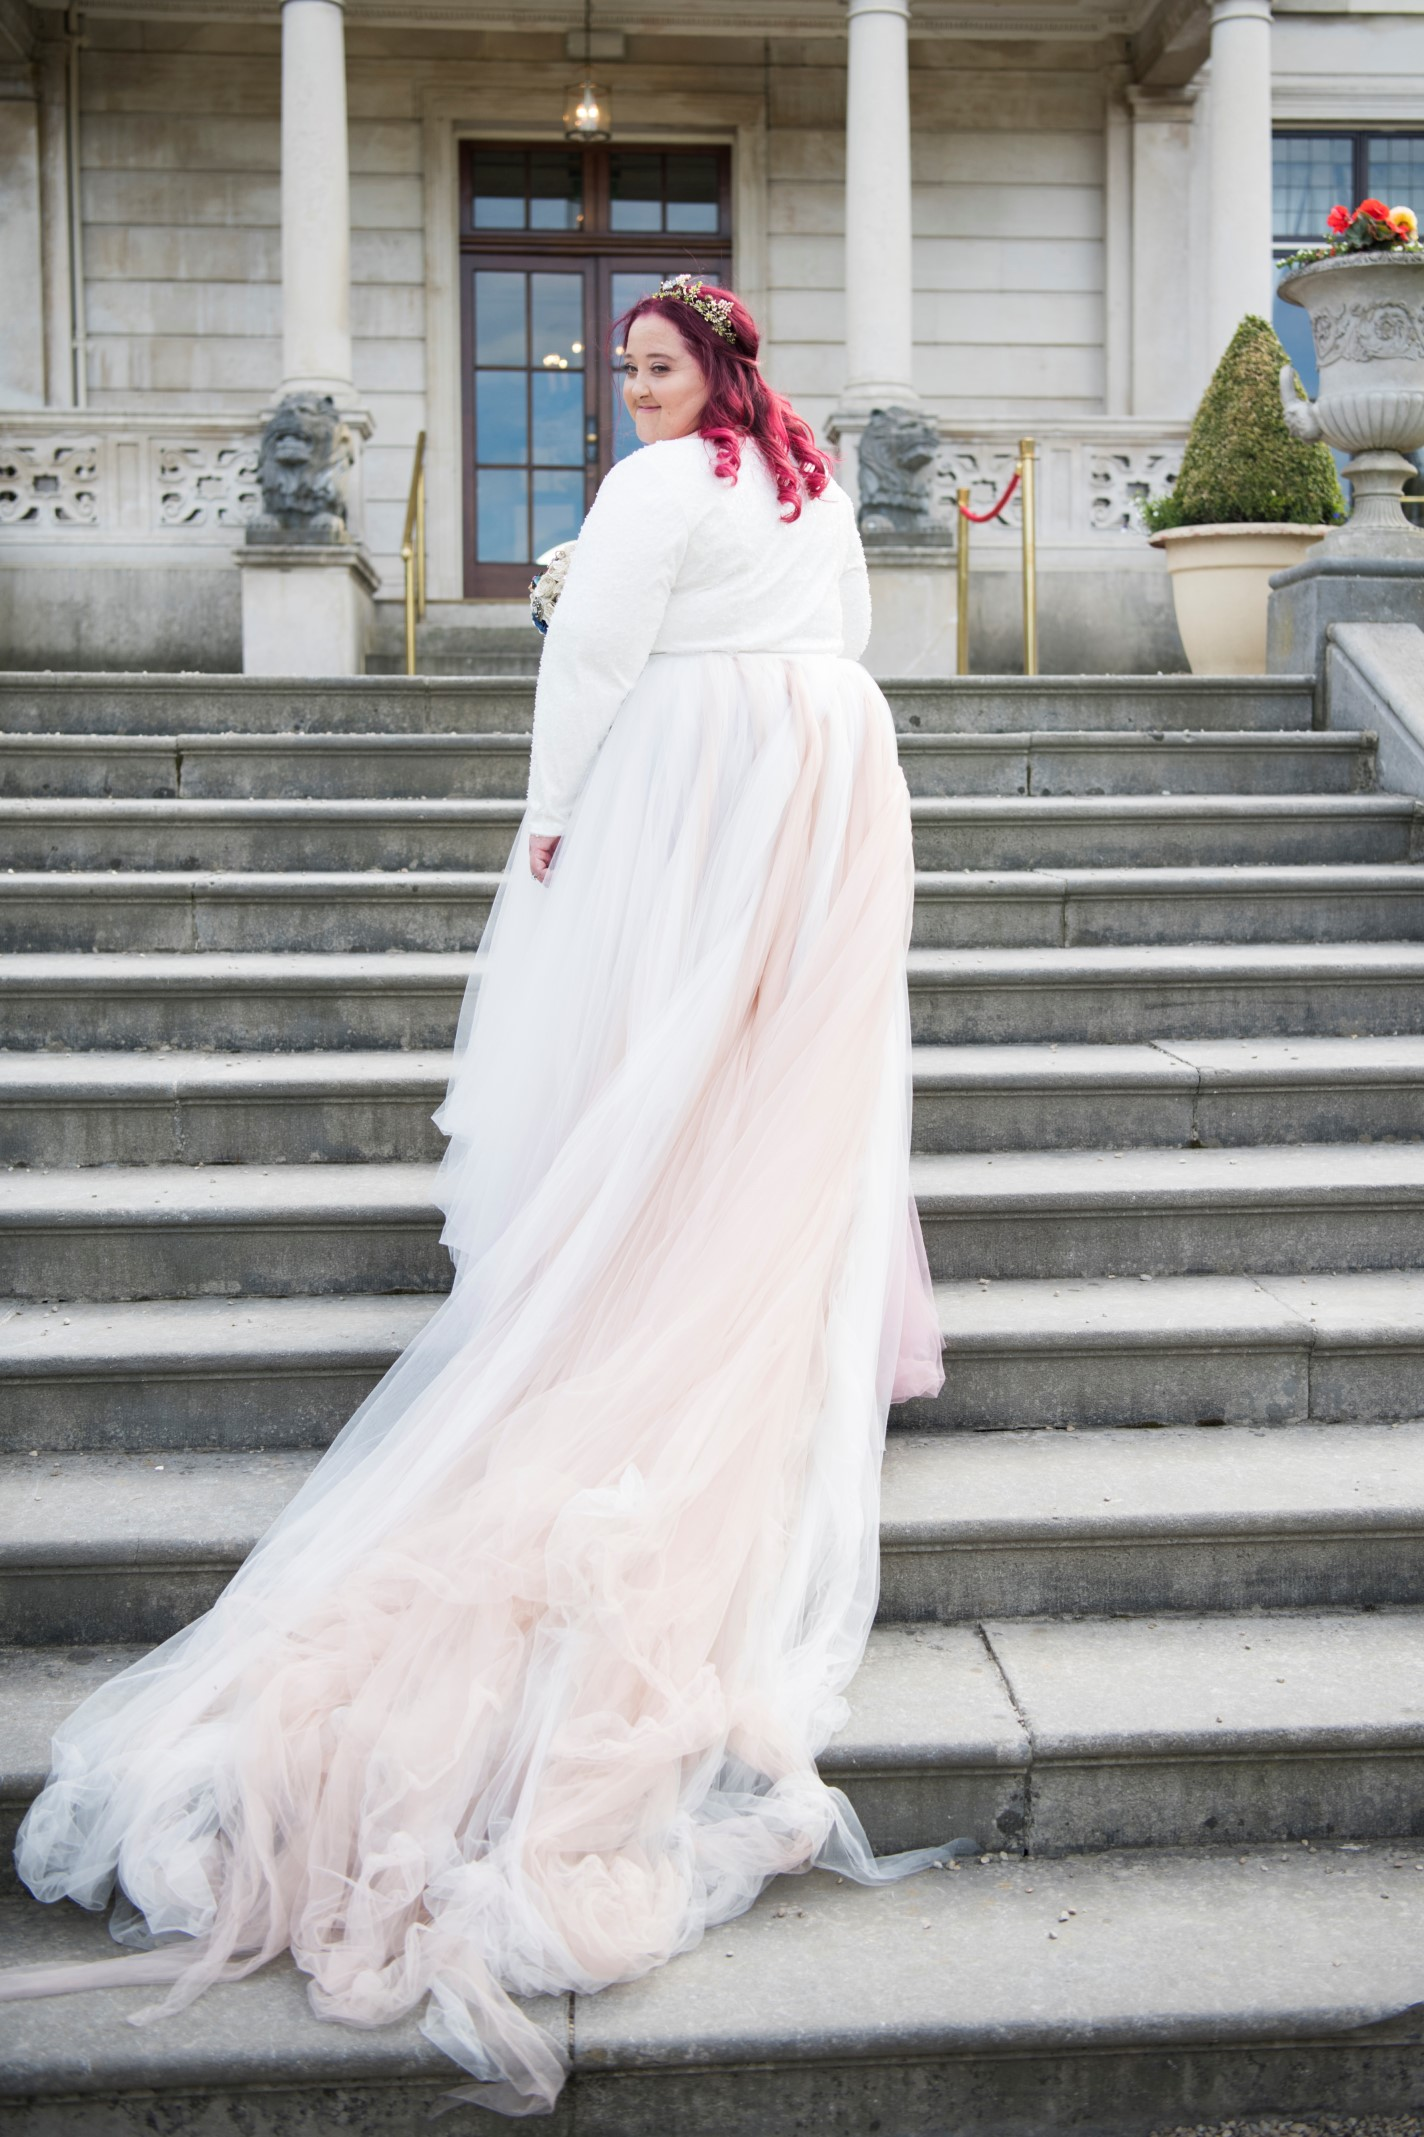 Zoo Wedding- Emma May Photography- Unconventional Wedding- Unique Wedding Inspiration- Pink Wedding Dress with train